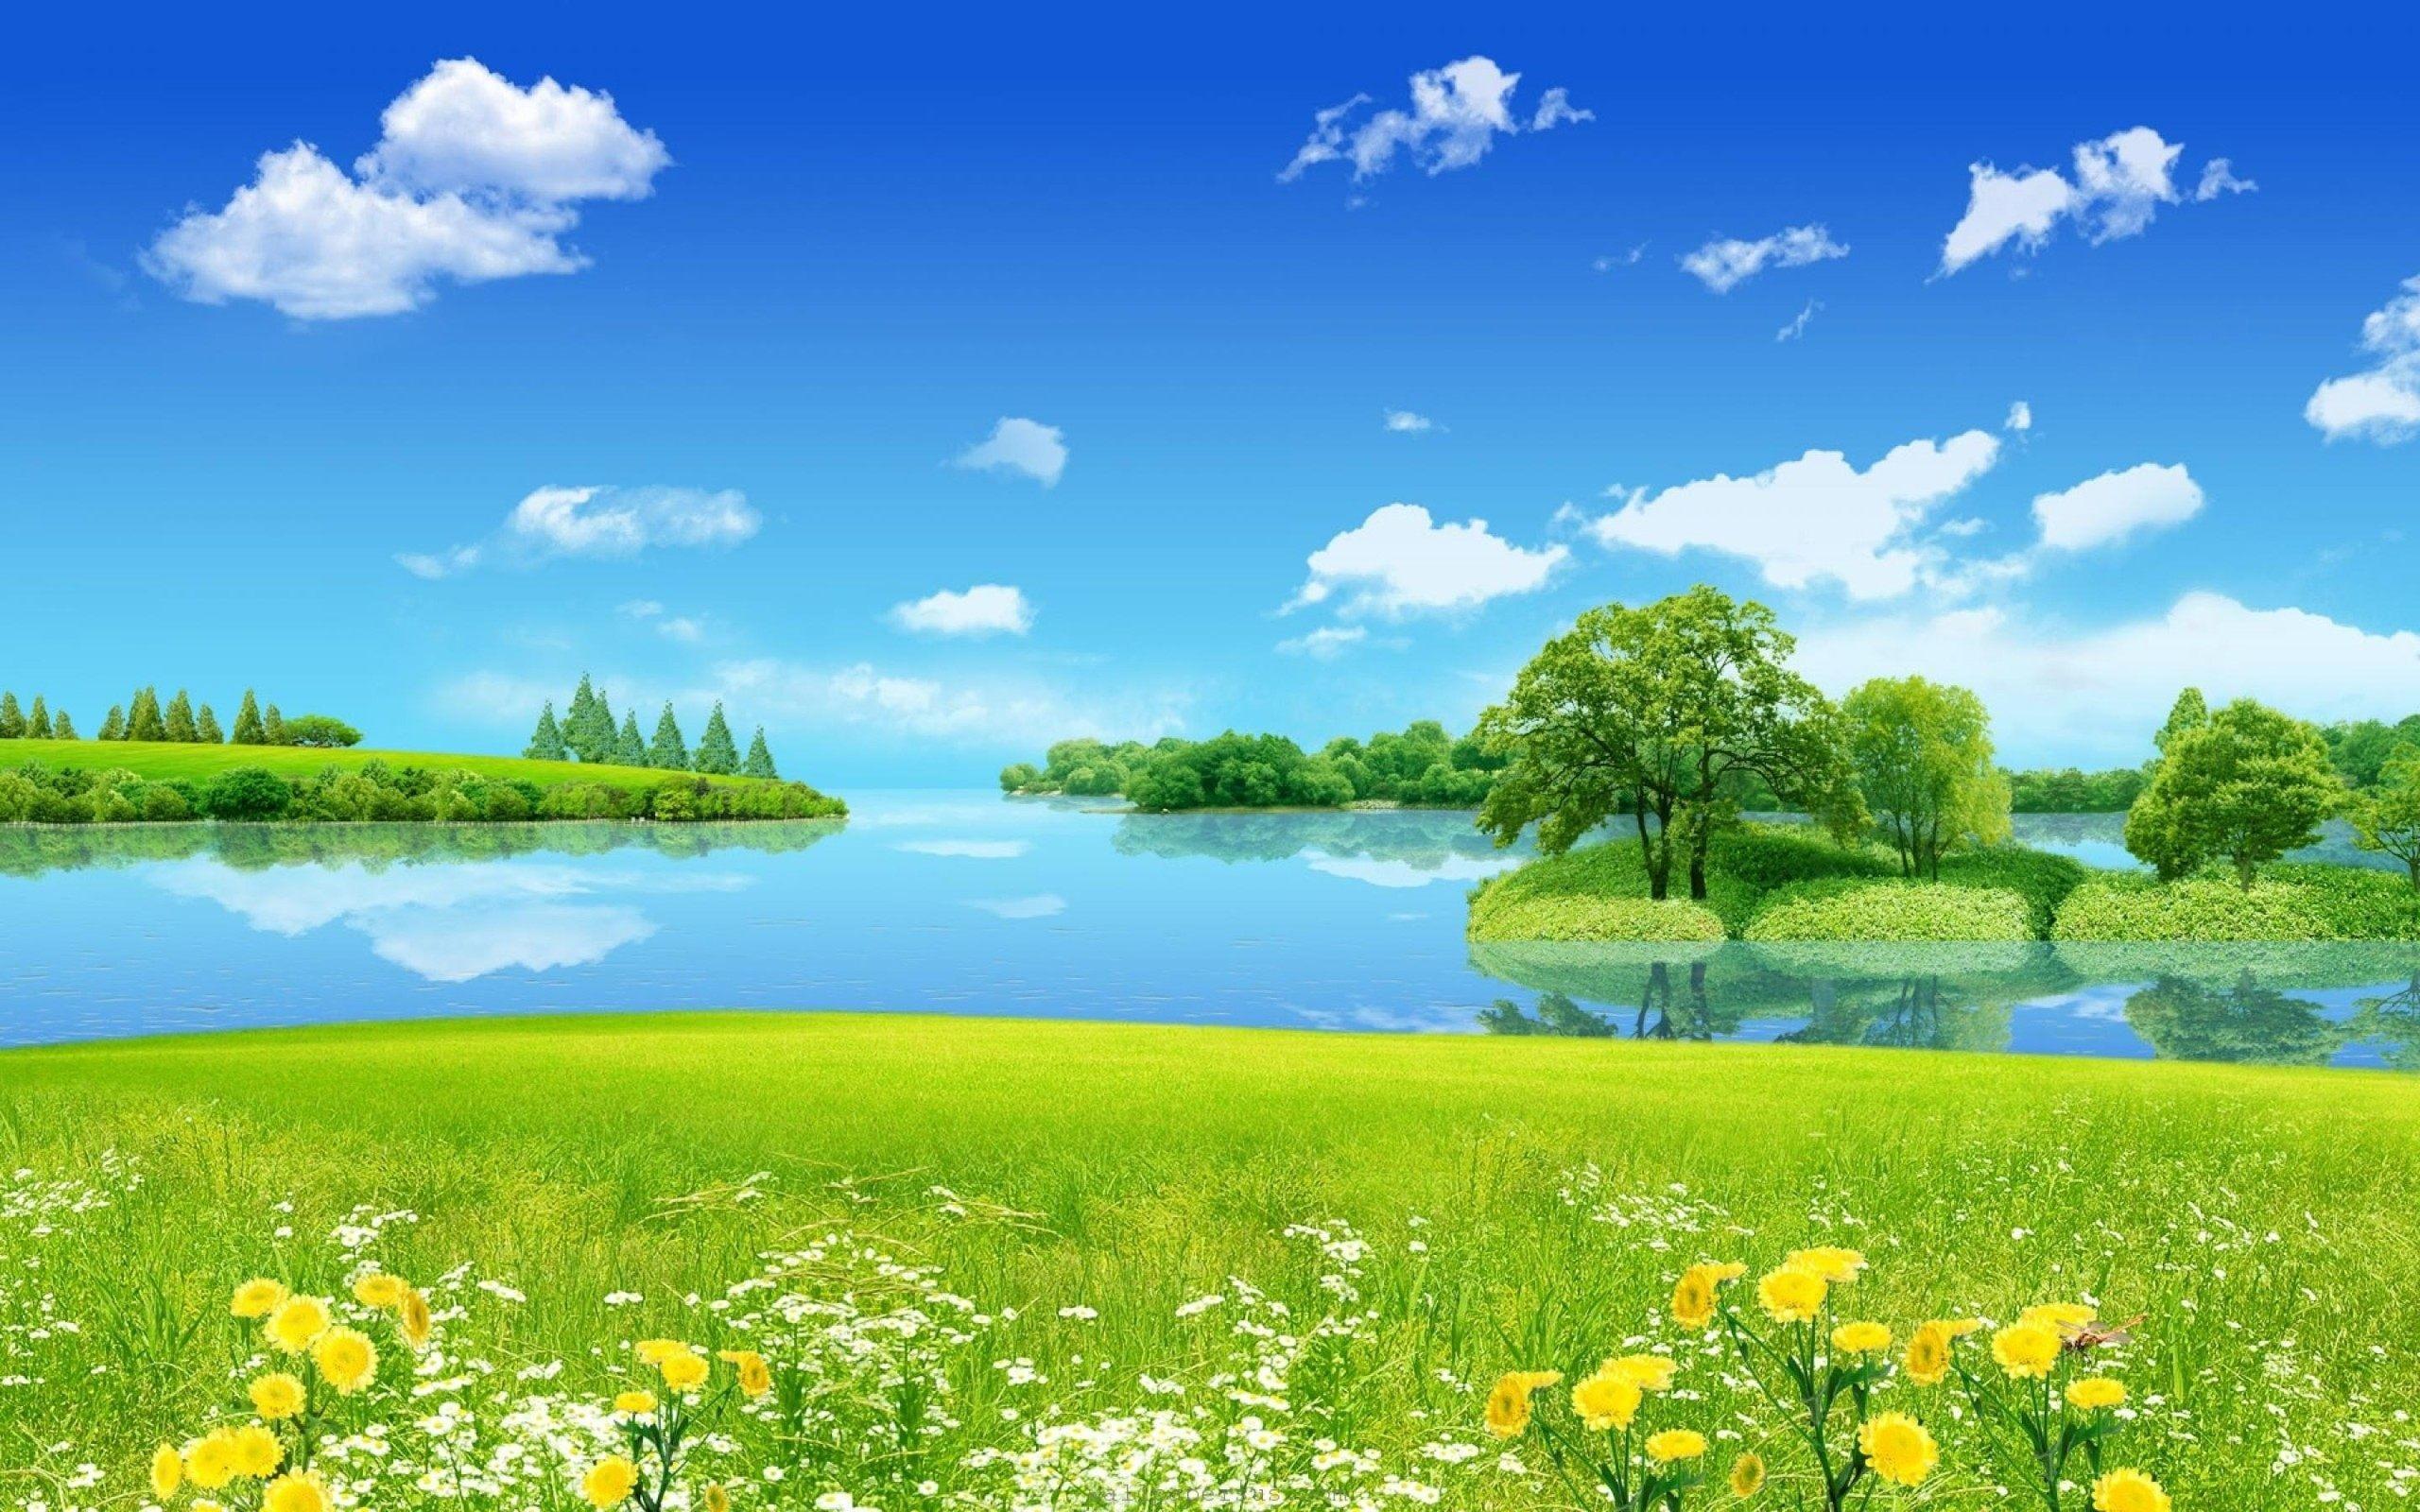 … Desktop Wallpaper, High Resolution,. Download Wallpaper / Select  Resolution ↓. Original. 2560×1600